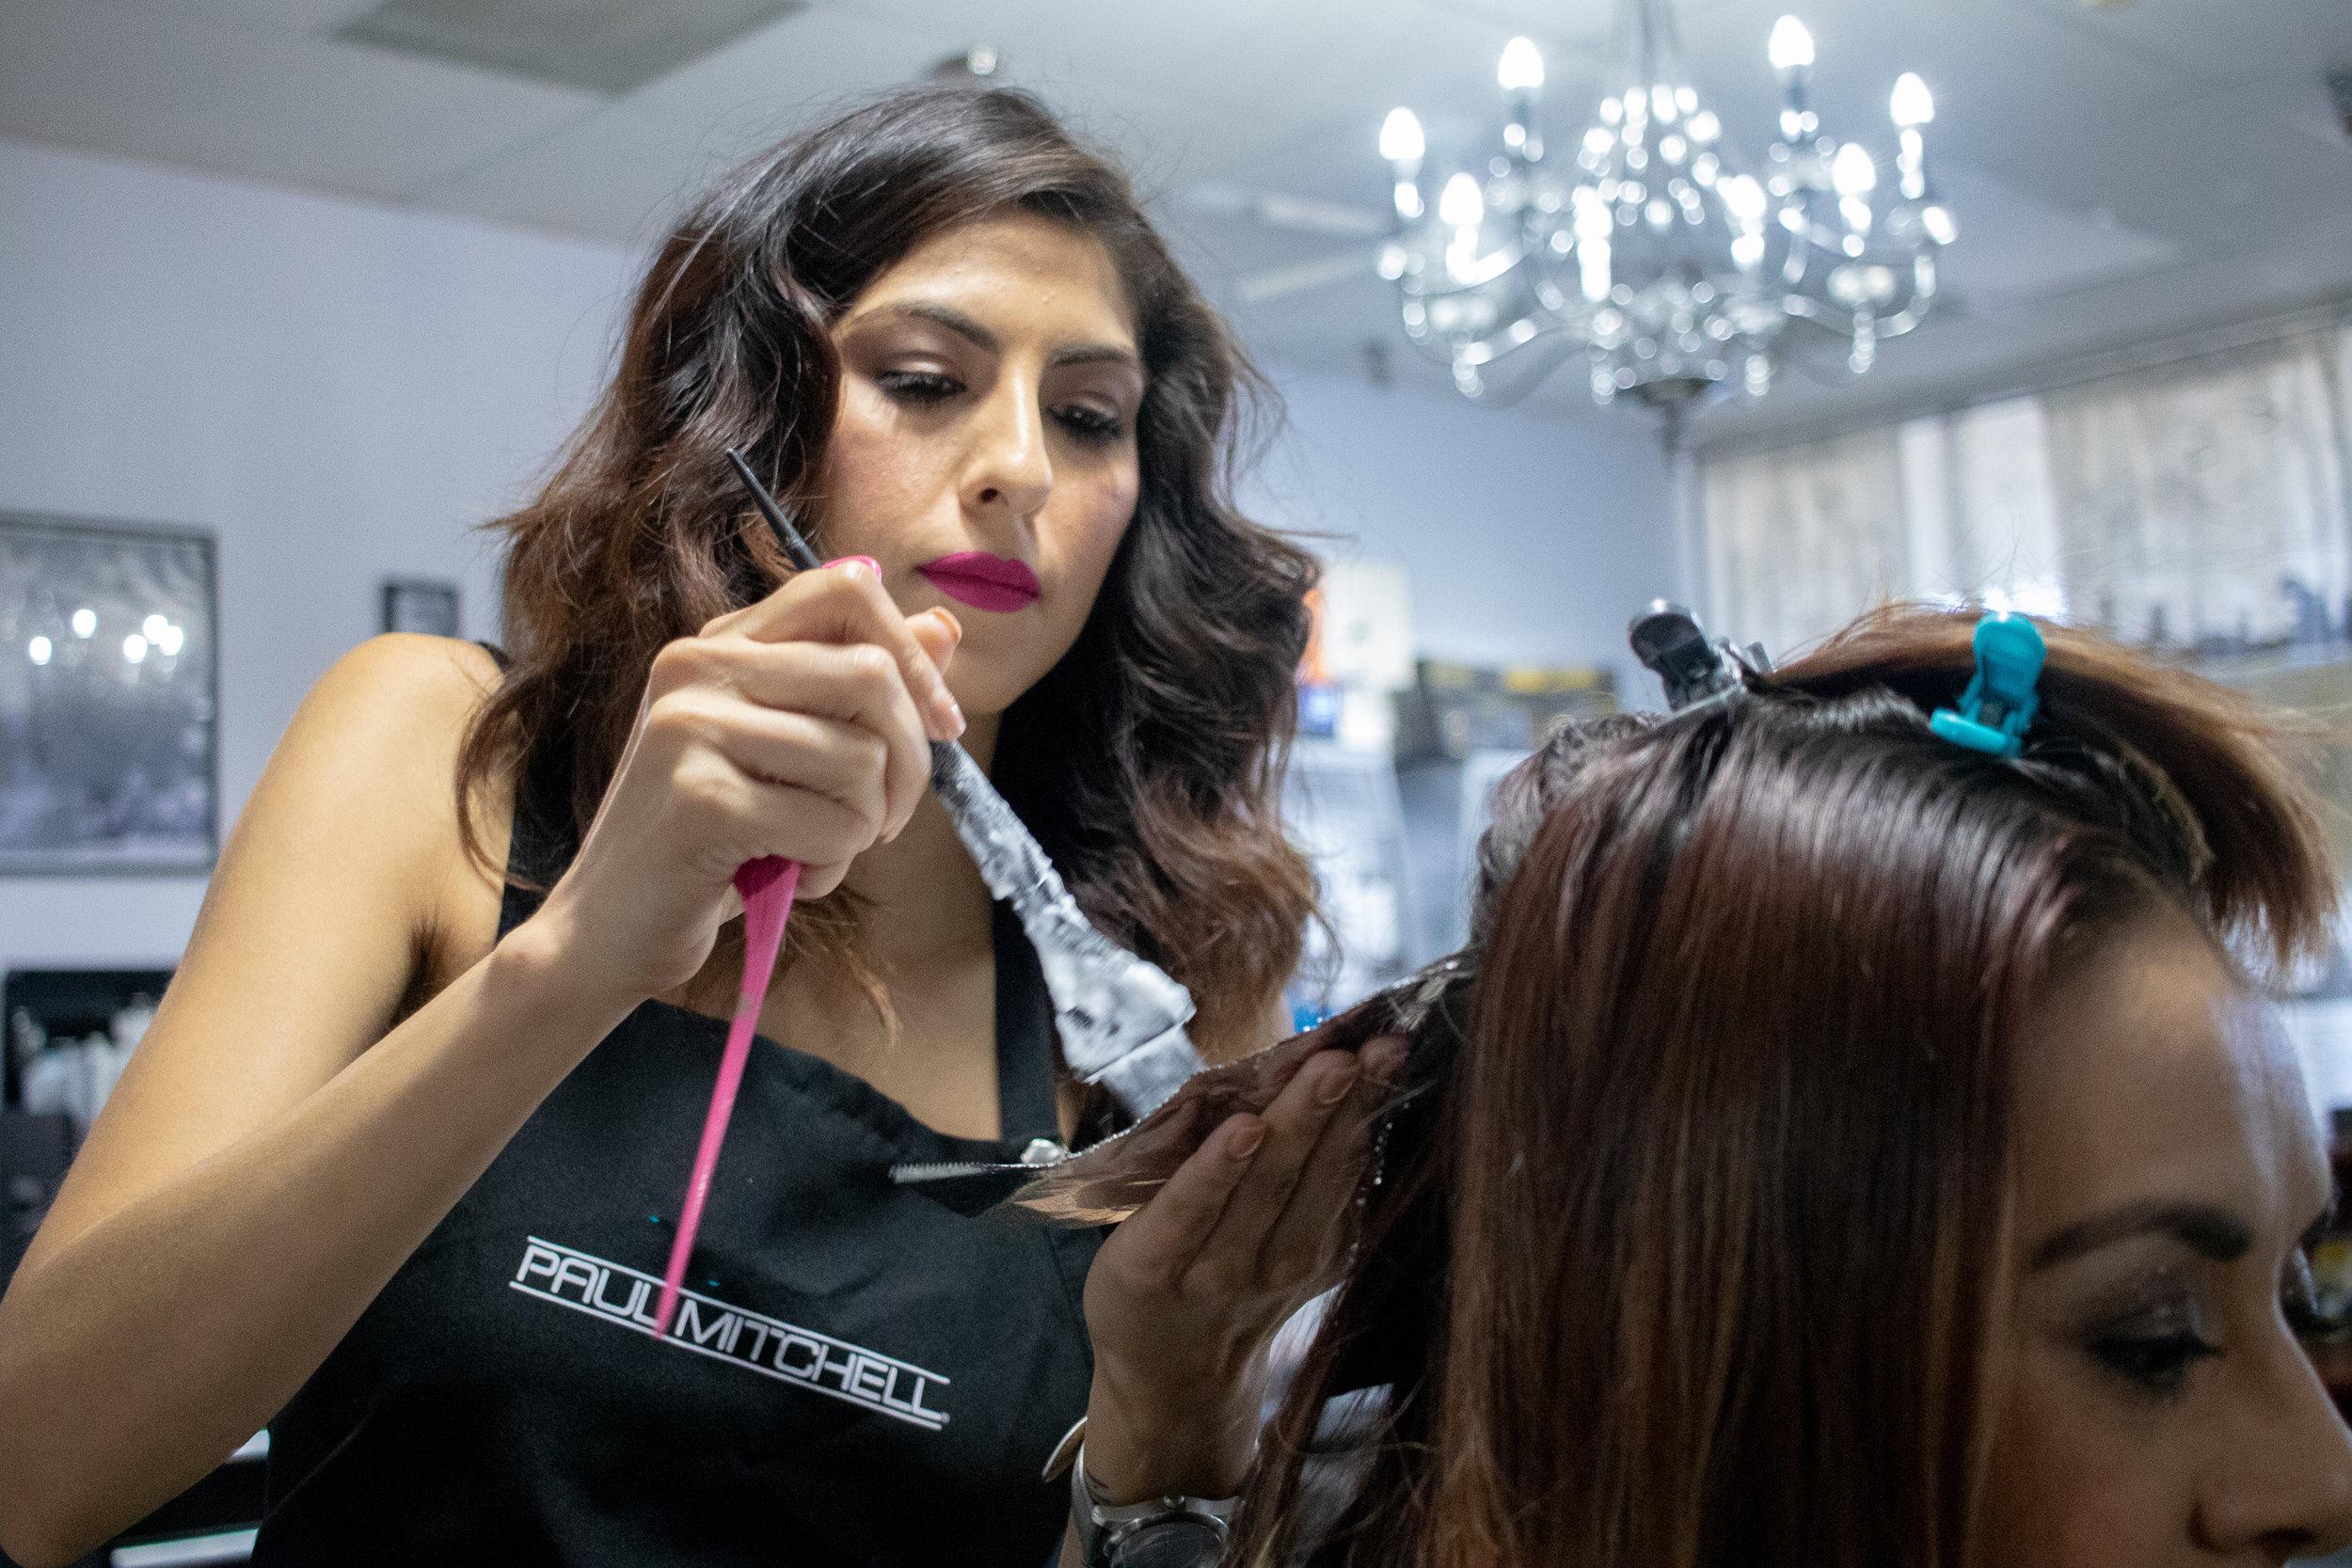 Revolver Hair Studio 09082018-25.jpg